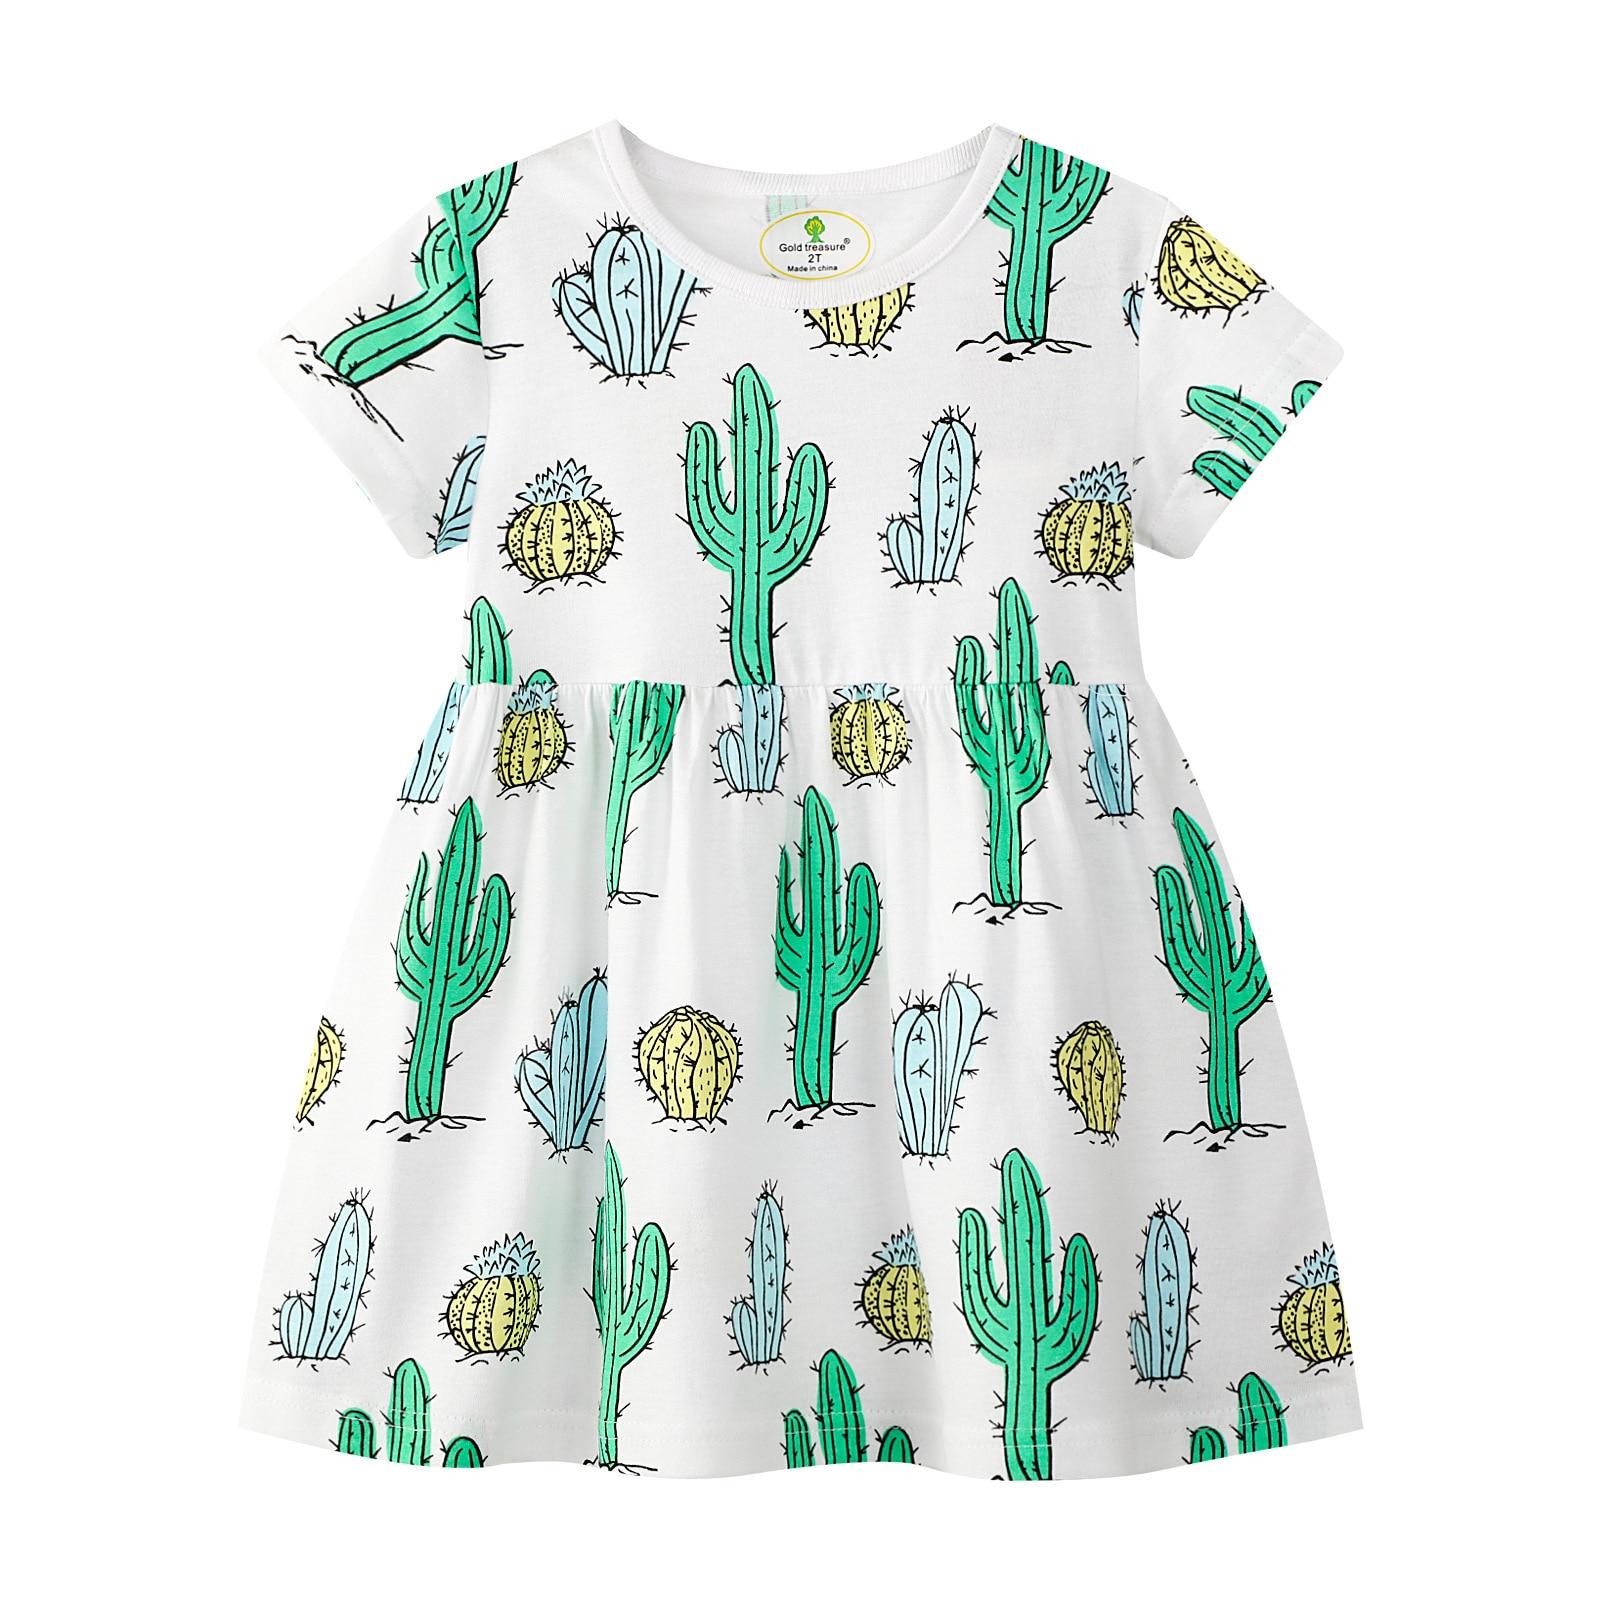 Fashion Girls Clothing Summer Toddler Girls Casual Dress Cacuts Print Children Dress